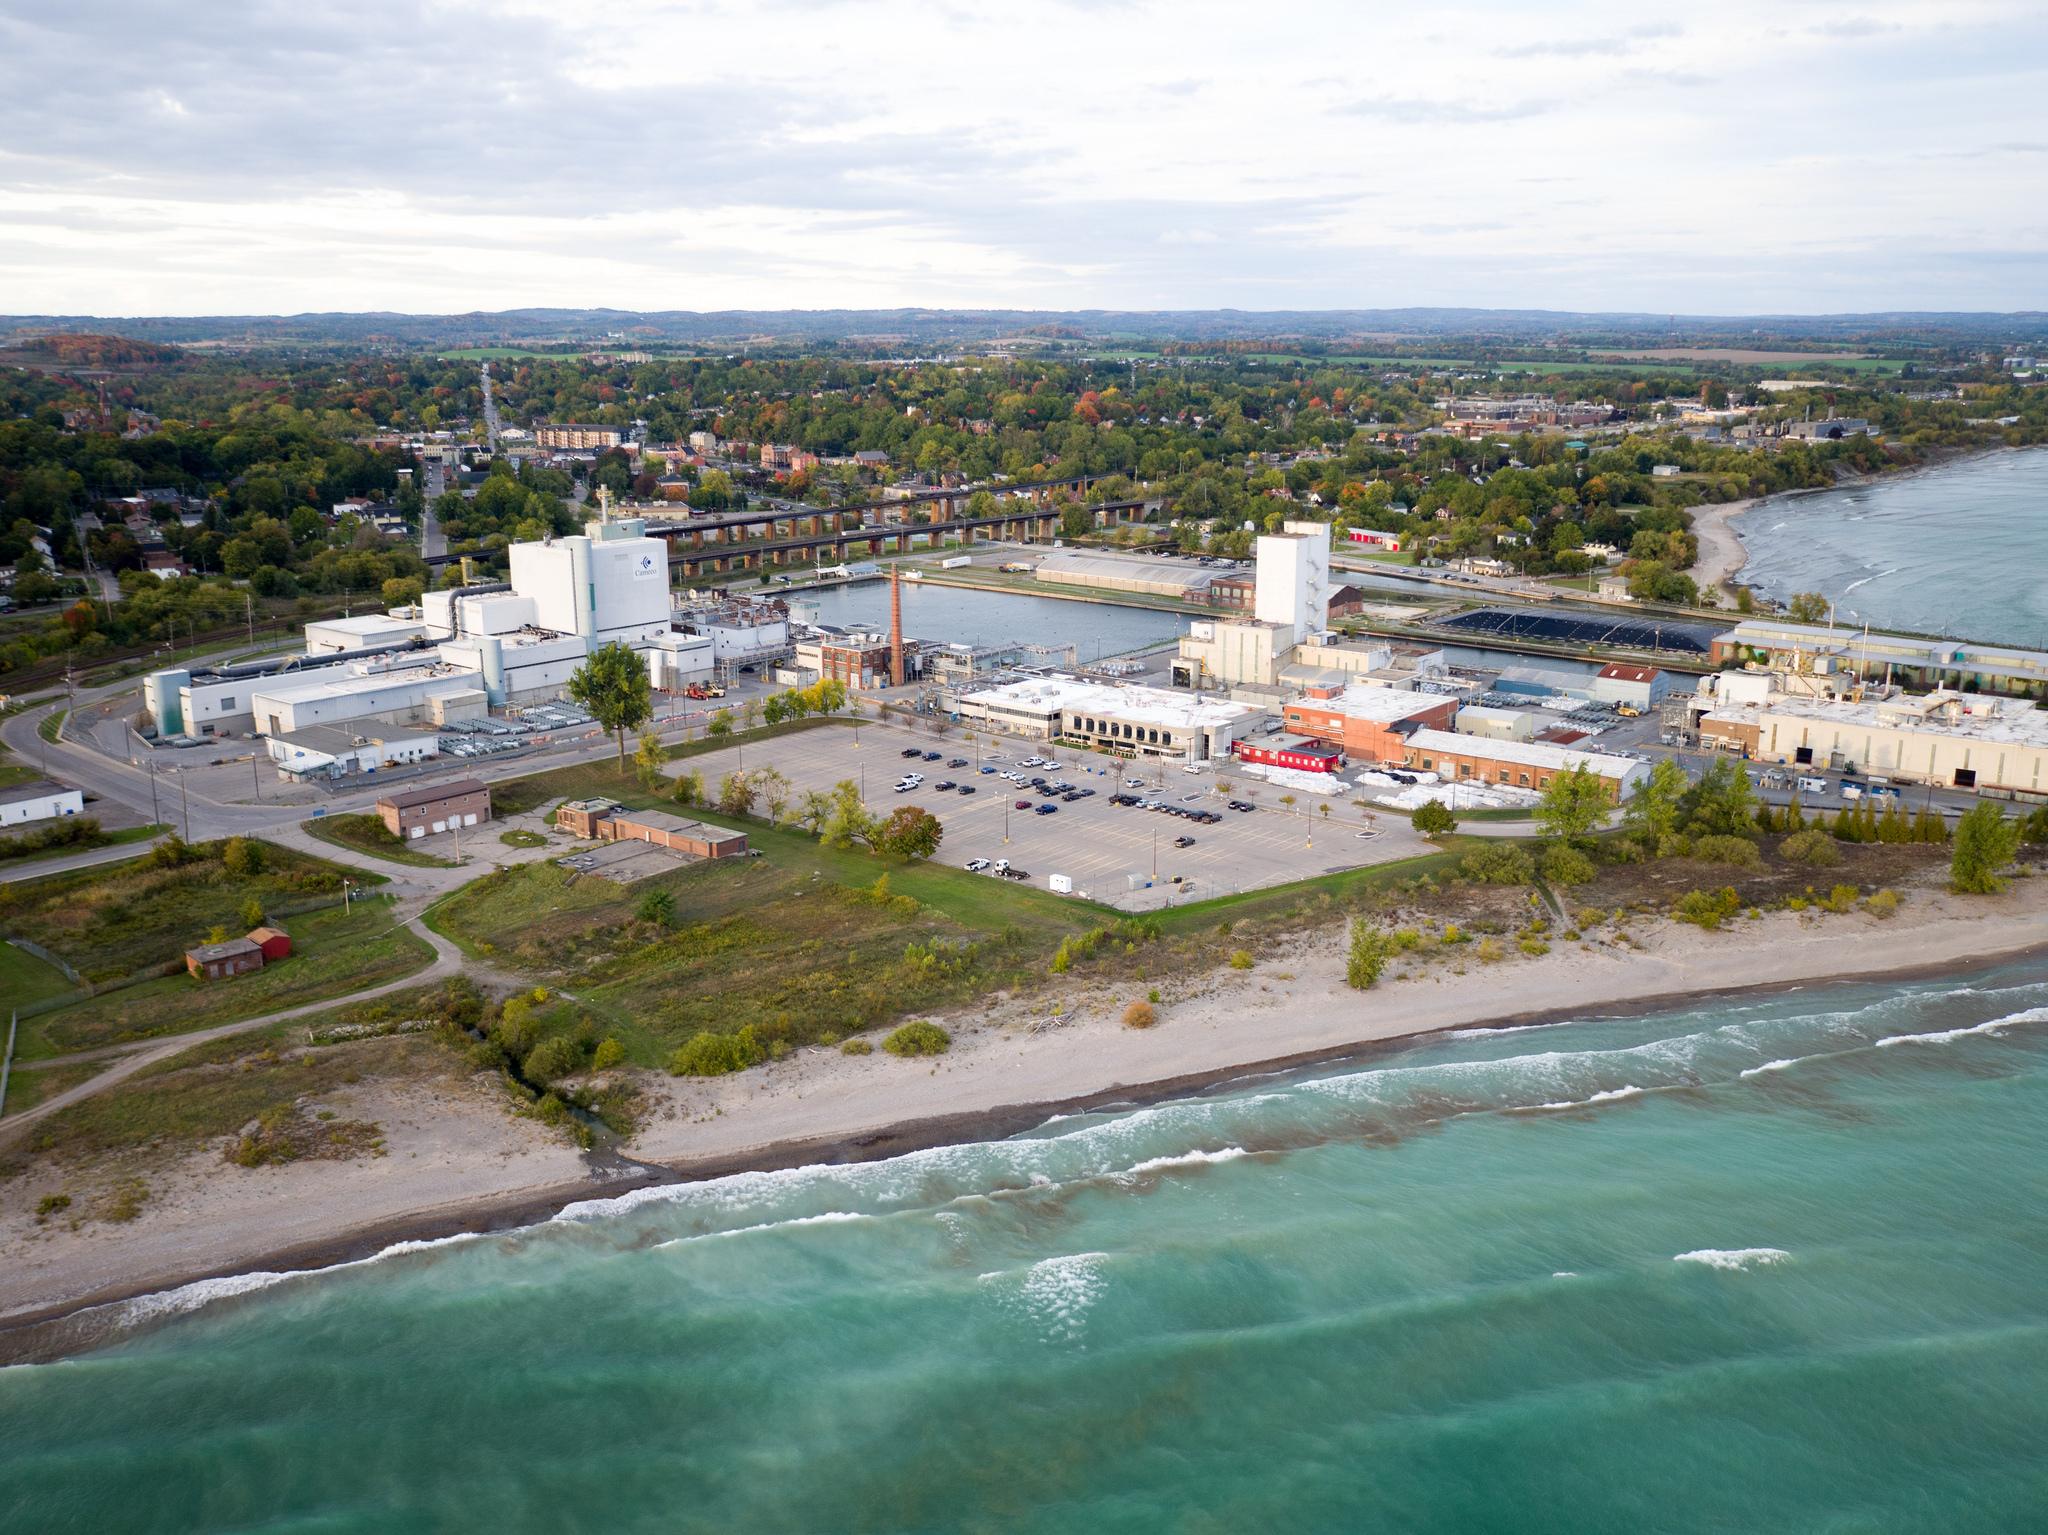 Port Hope Conversion Facility, October 2016.